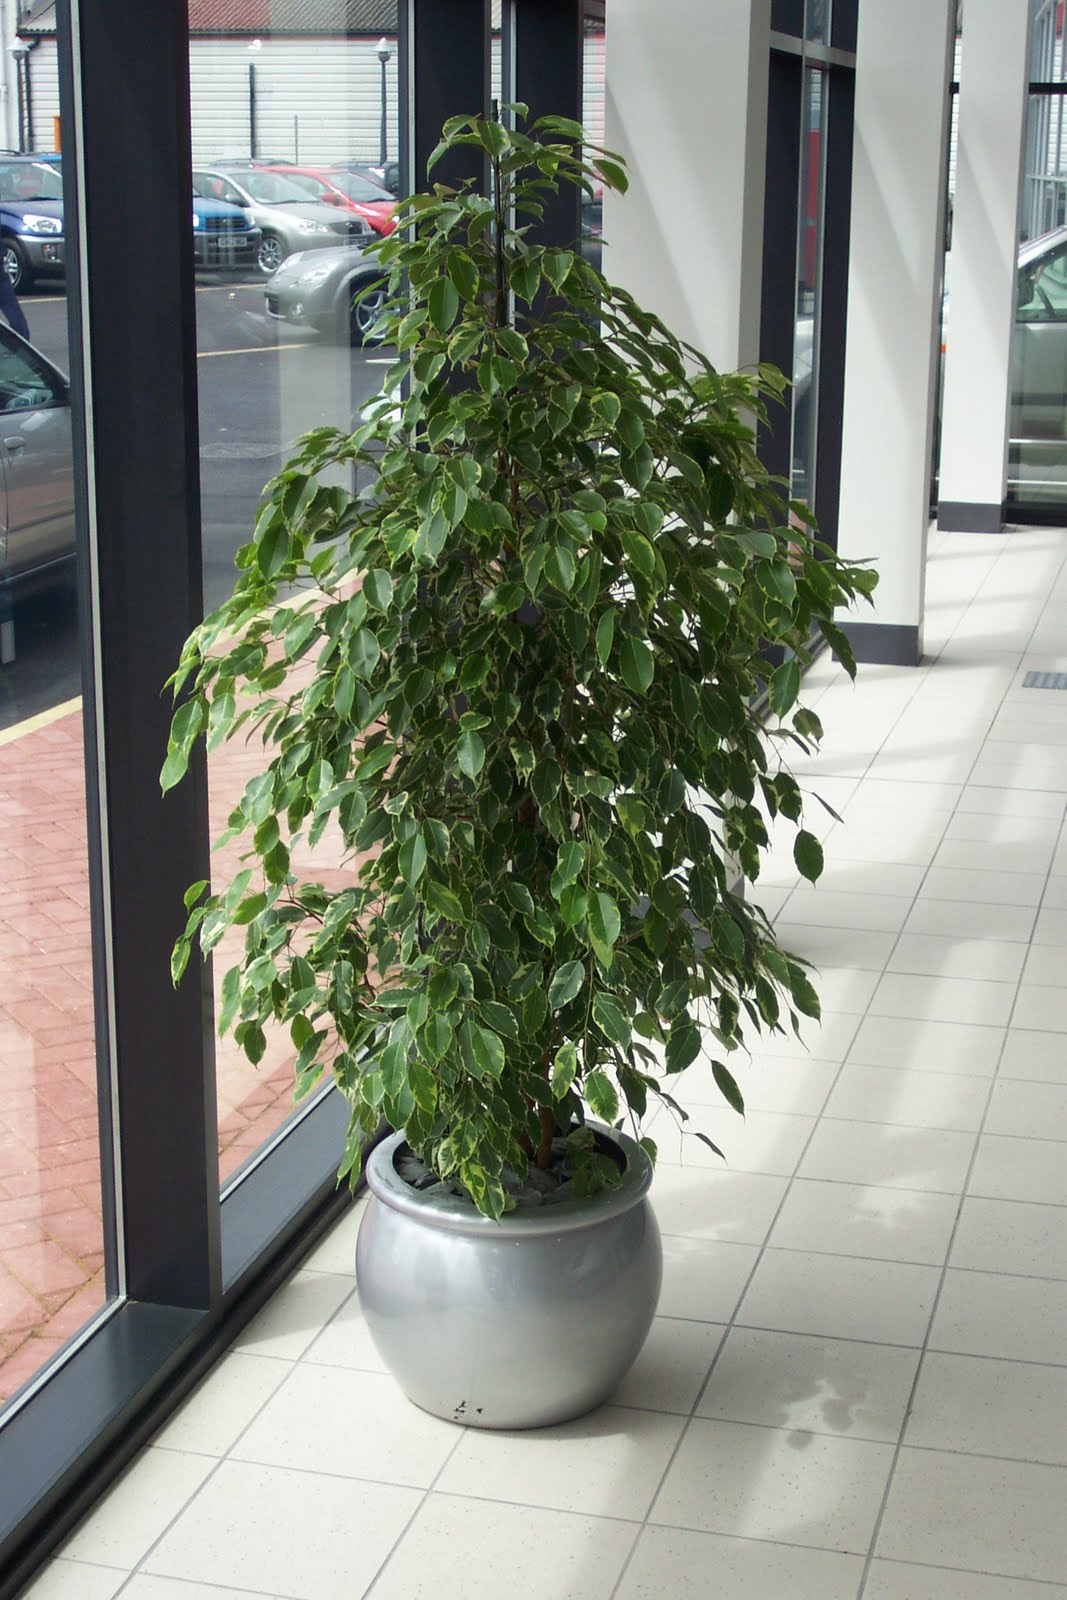 Stewarts office plants ficus benjamina - Interior plant maintenance contract ...